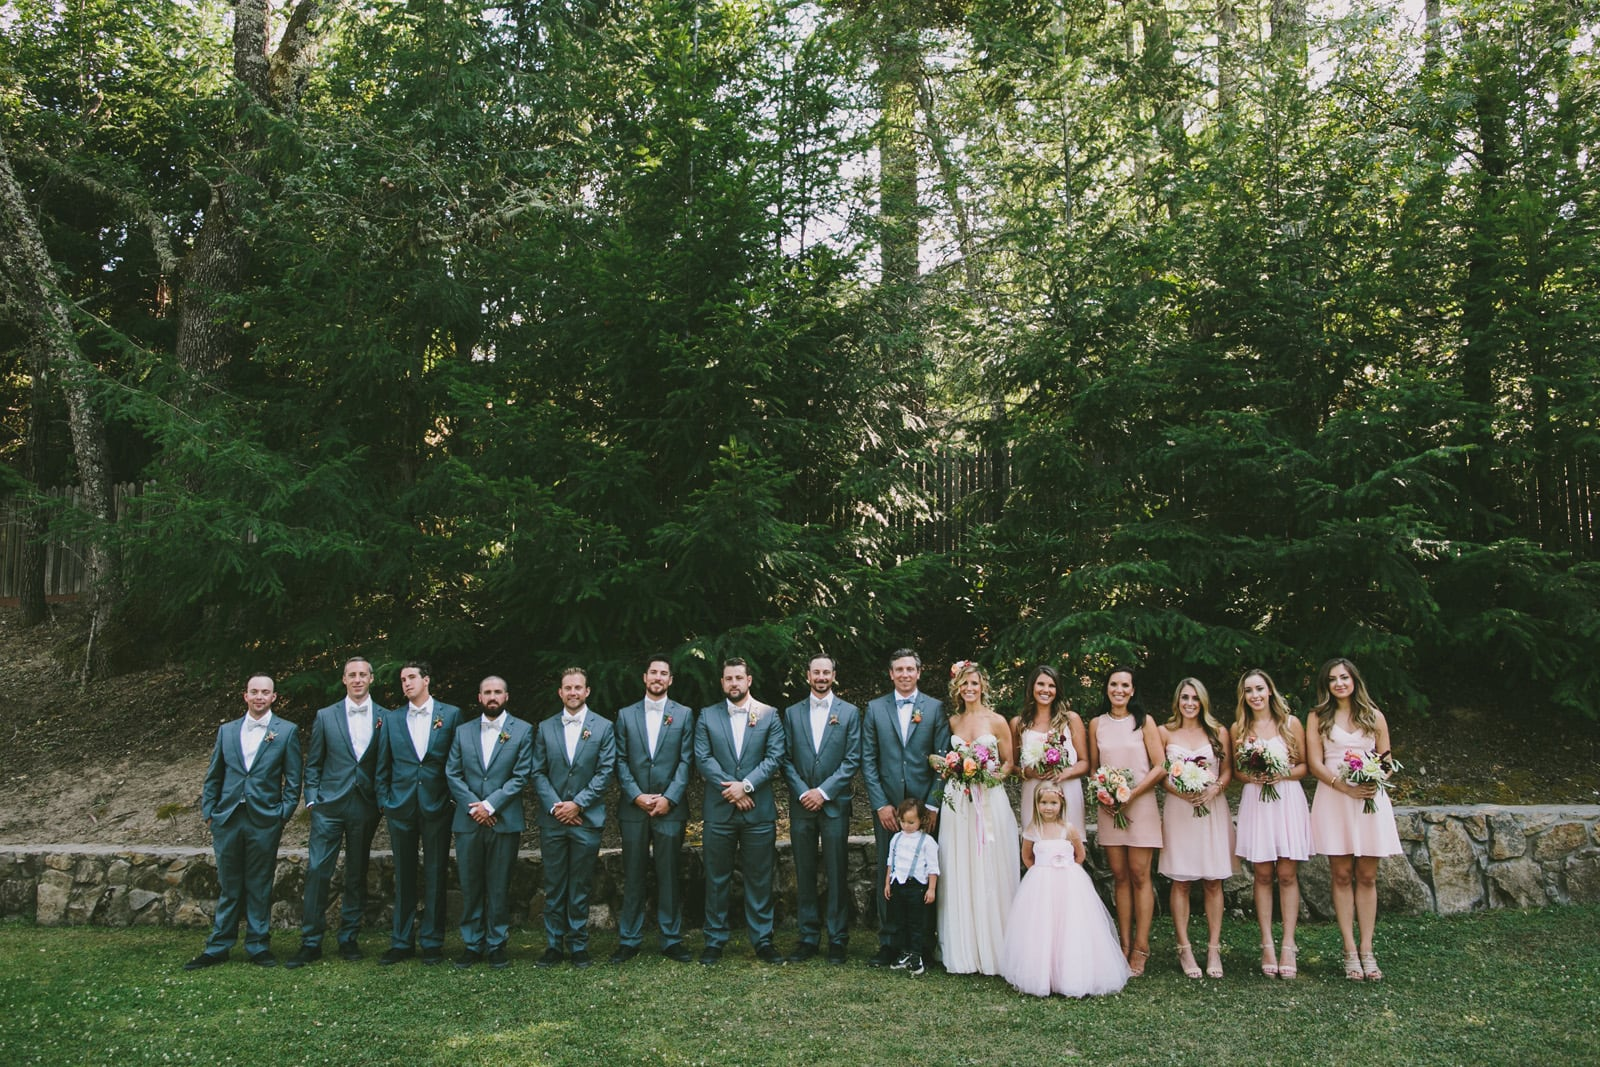 radonich_ranch_wedding_los_gatos_wedding_028